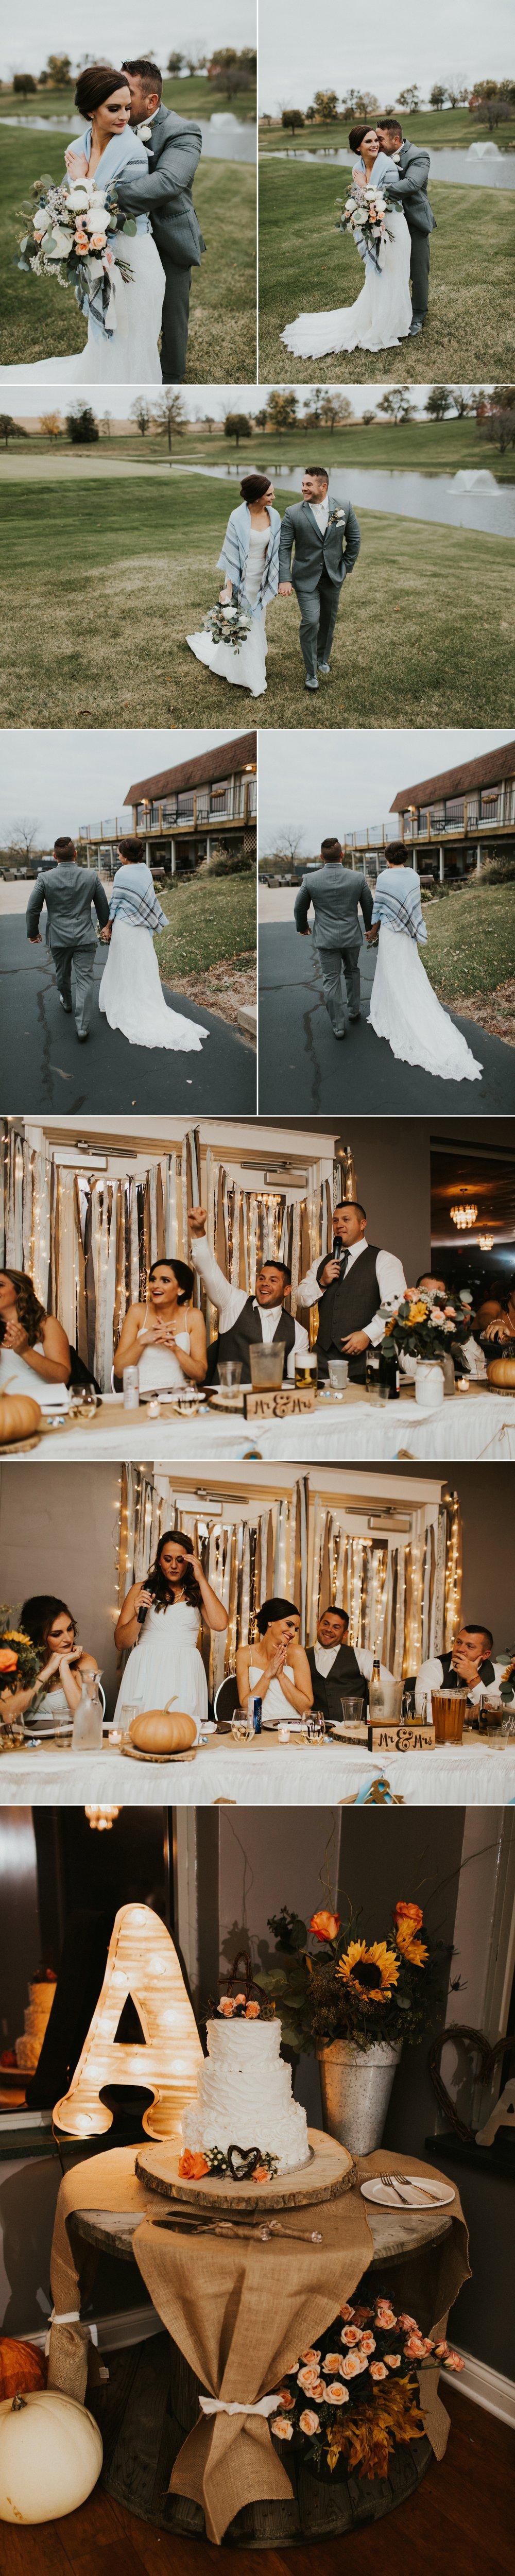 The Ault Wedding 13.jpg